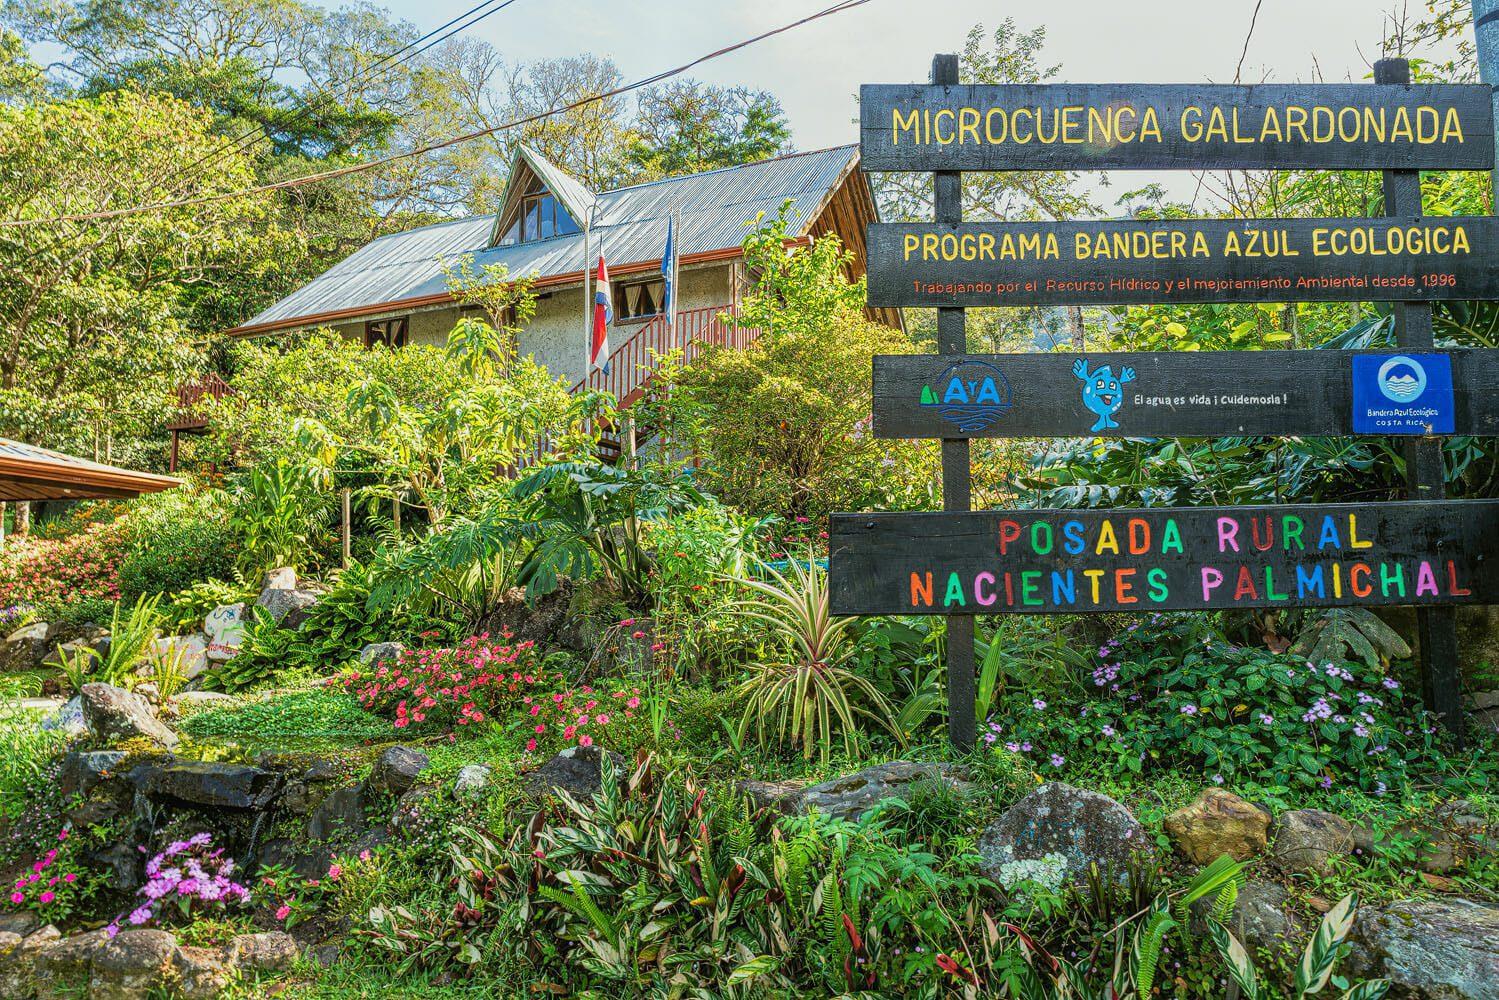 Posada Rural Nacientes Palmichal - San Pablo - Costa Rica